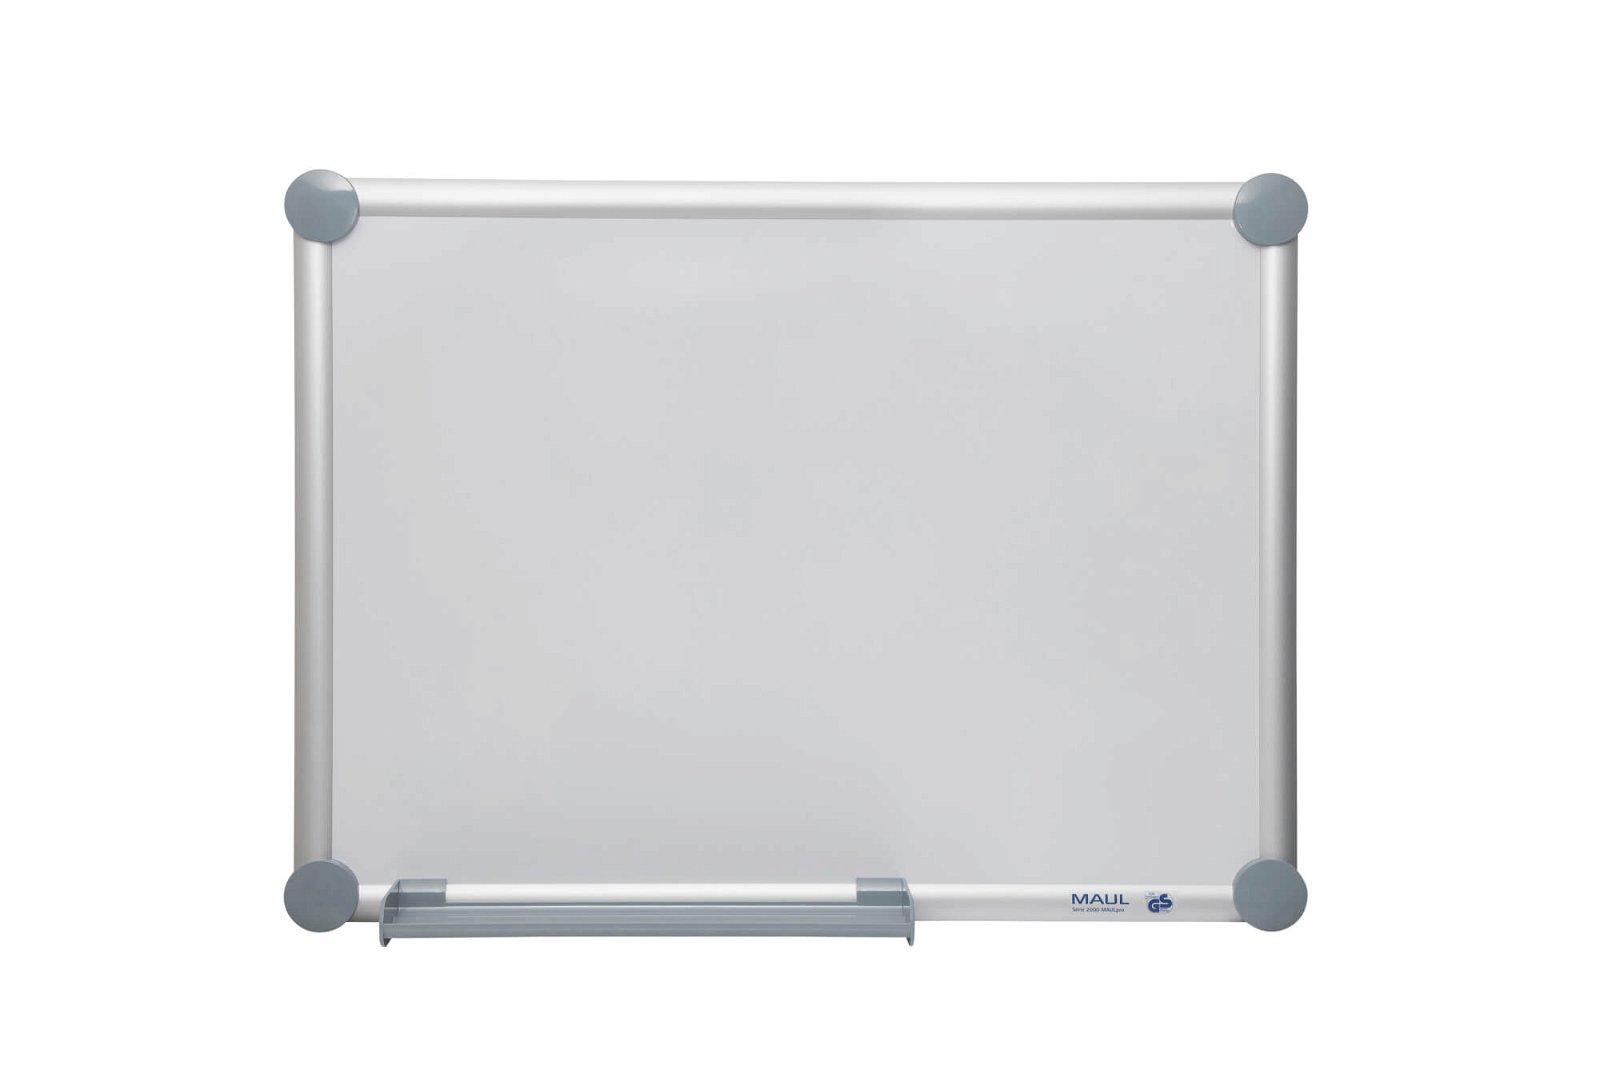 Whiteboard 2000 MAULpro, 45x60 cm, grau